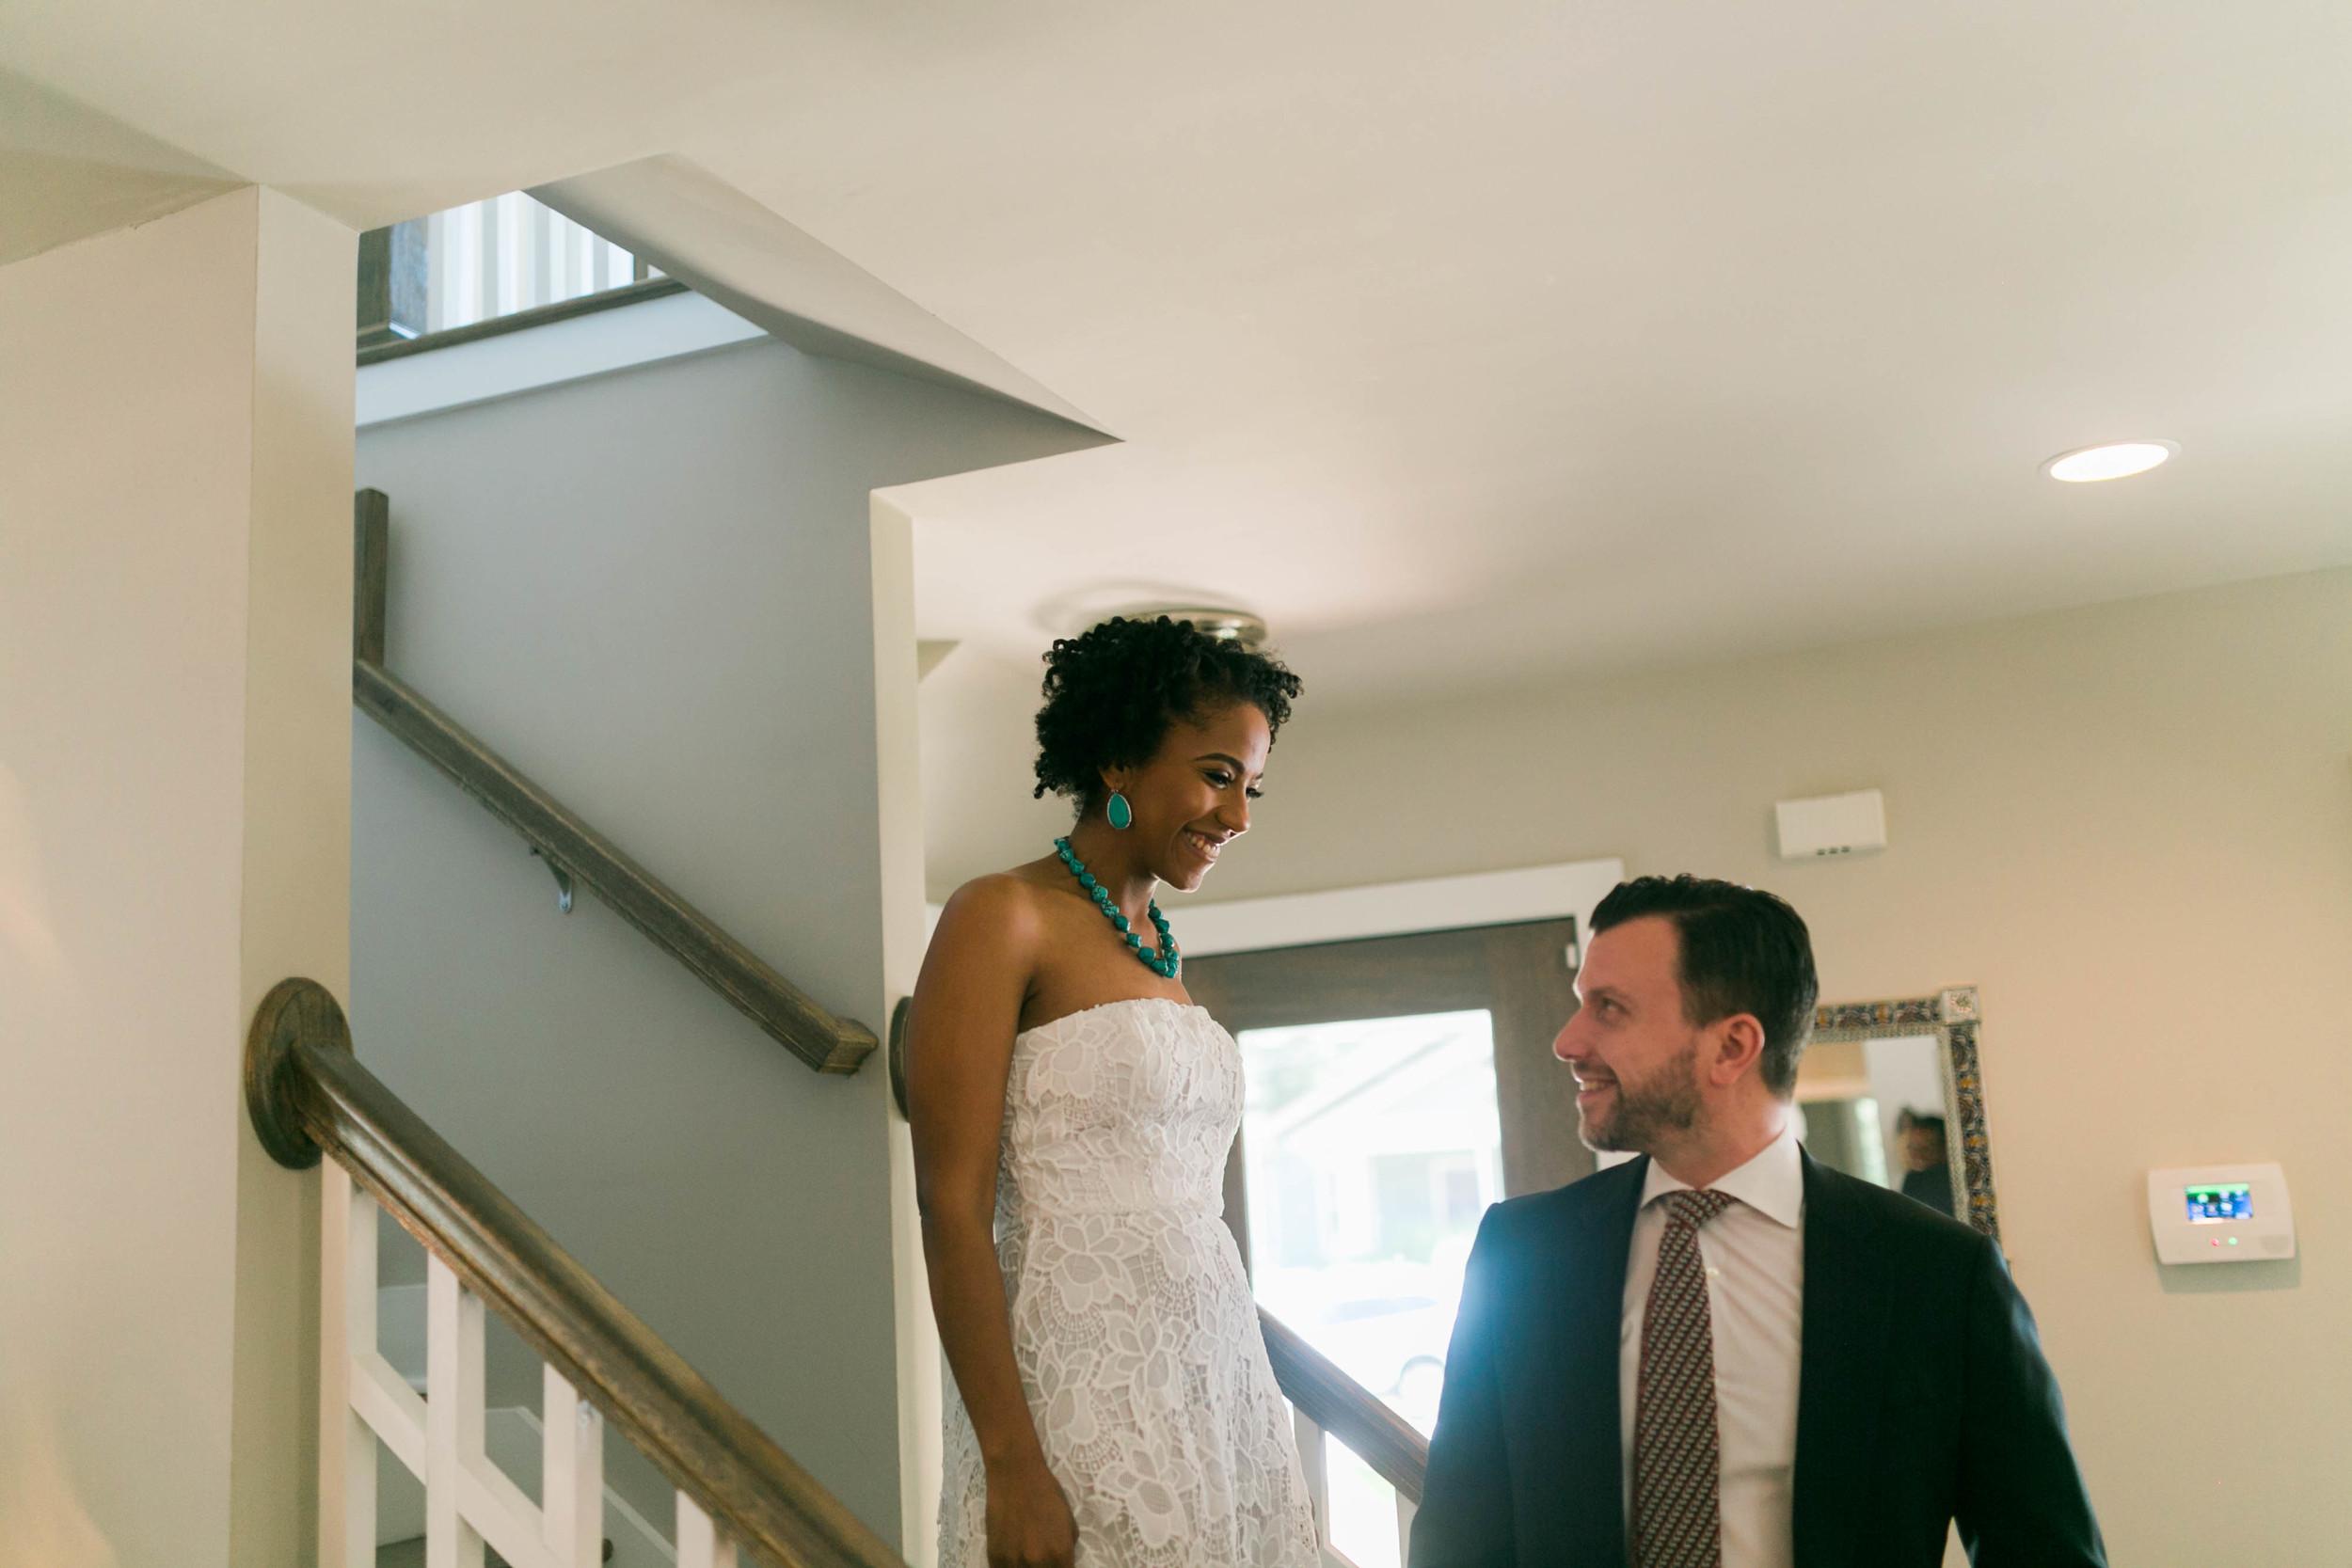 Dekalb-County-Courthouse-Wedding-Photos-Kiyah-C-Photography-19.jpg